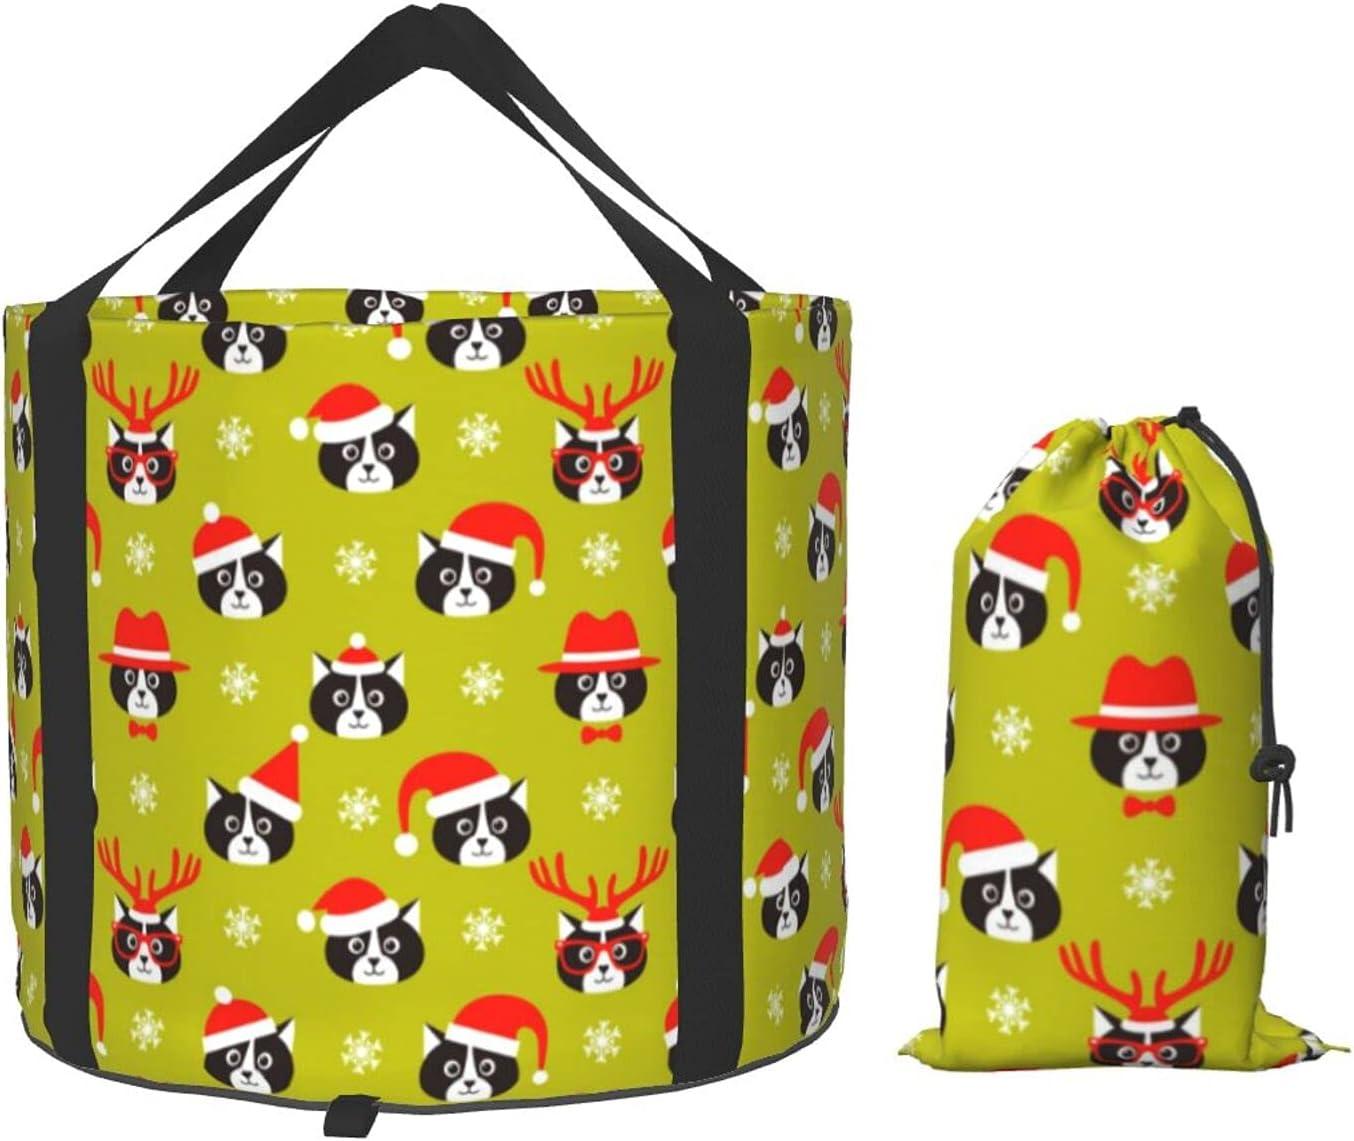 Multifunctional Portable Collapsible Bucket Xmas Daily bargain sale Over item handling Foldi Cat Santa